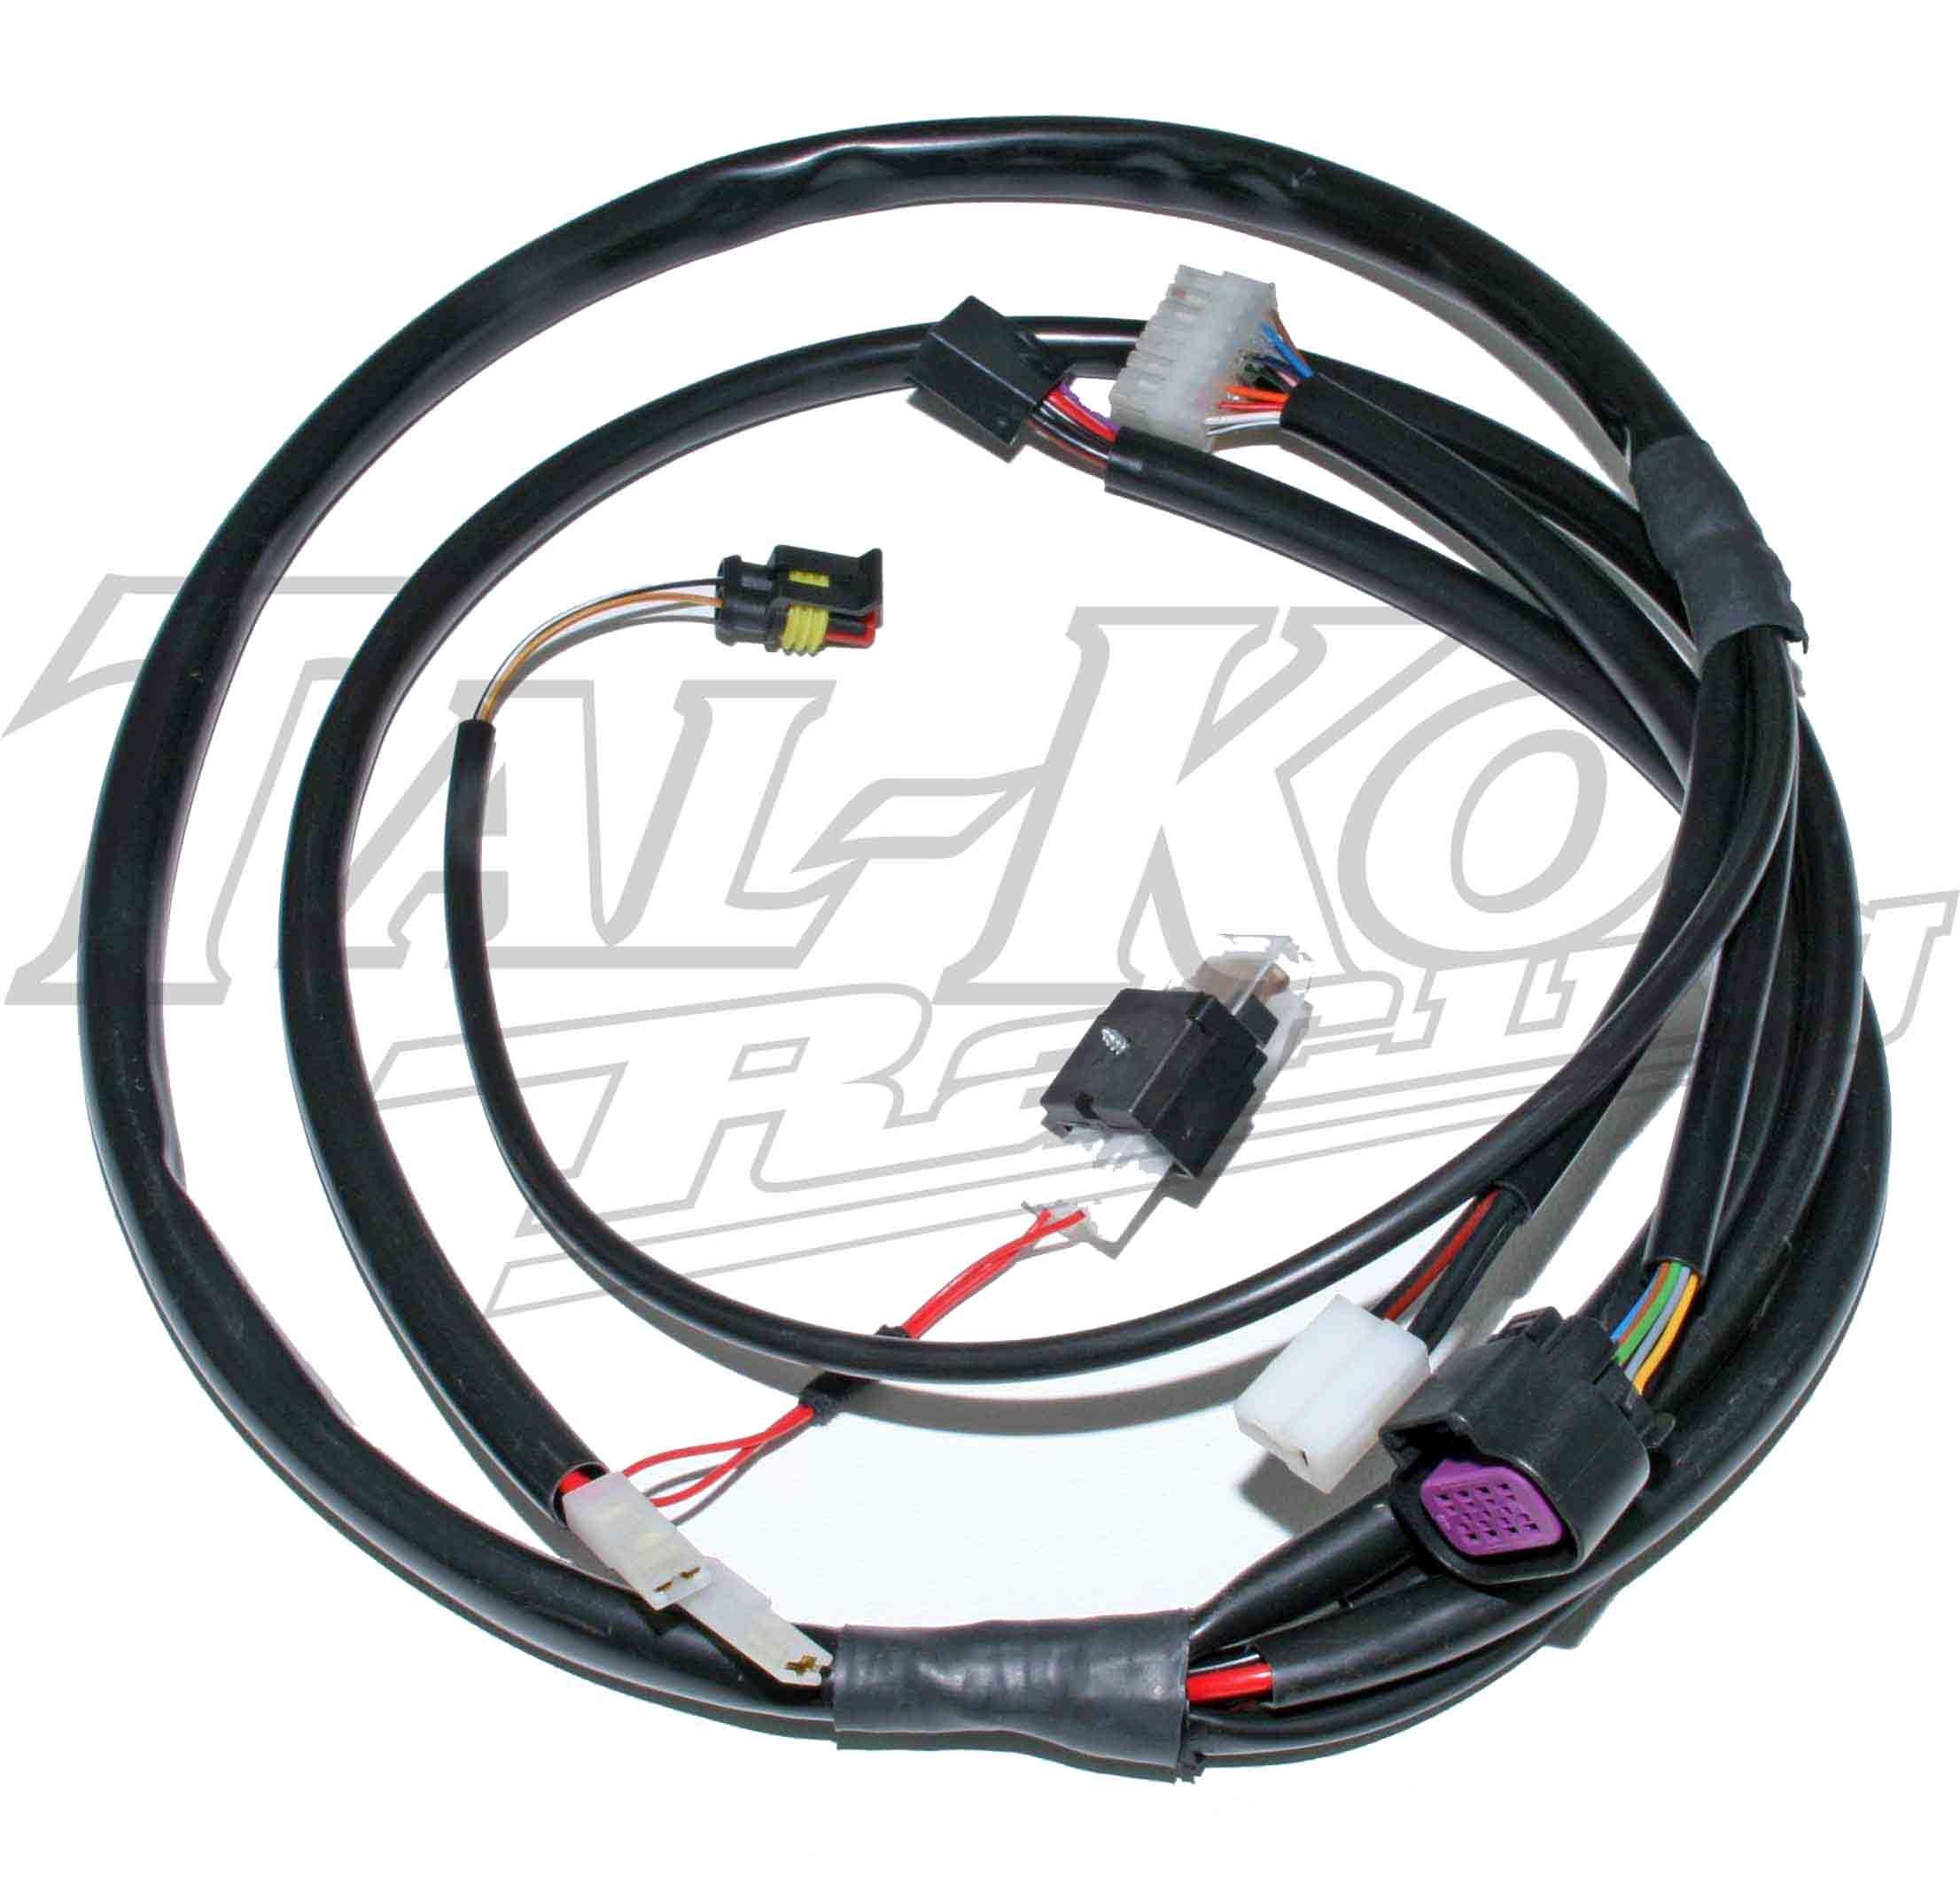 Pvl Wiring Harness Quick Wire Tkm Bt82 Tag